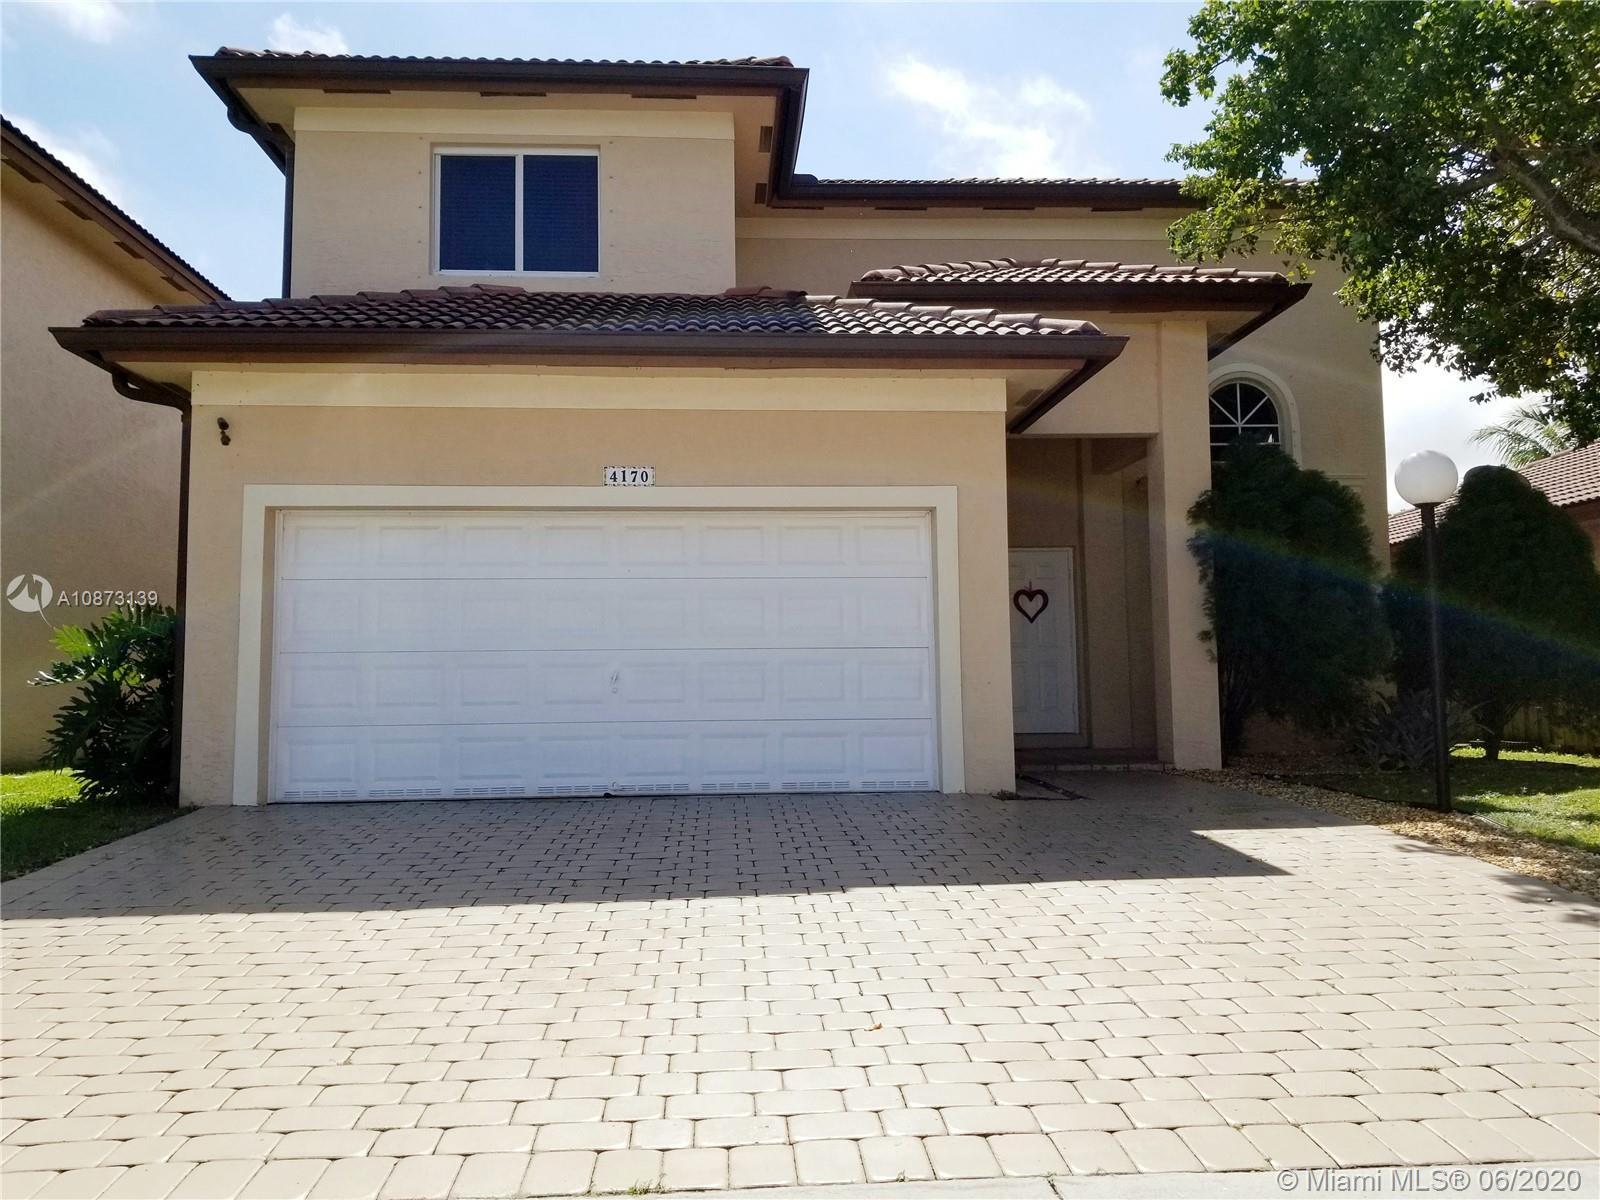 4170 NE 26th Ct Property Photo - Homestead, FL real estate listing